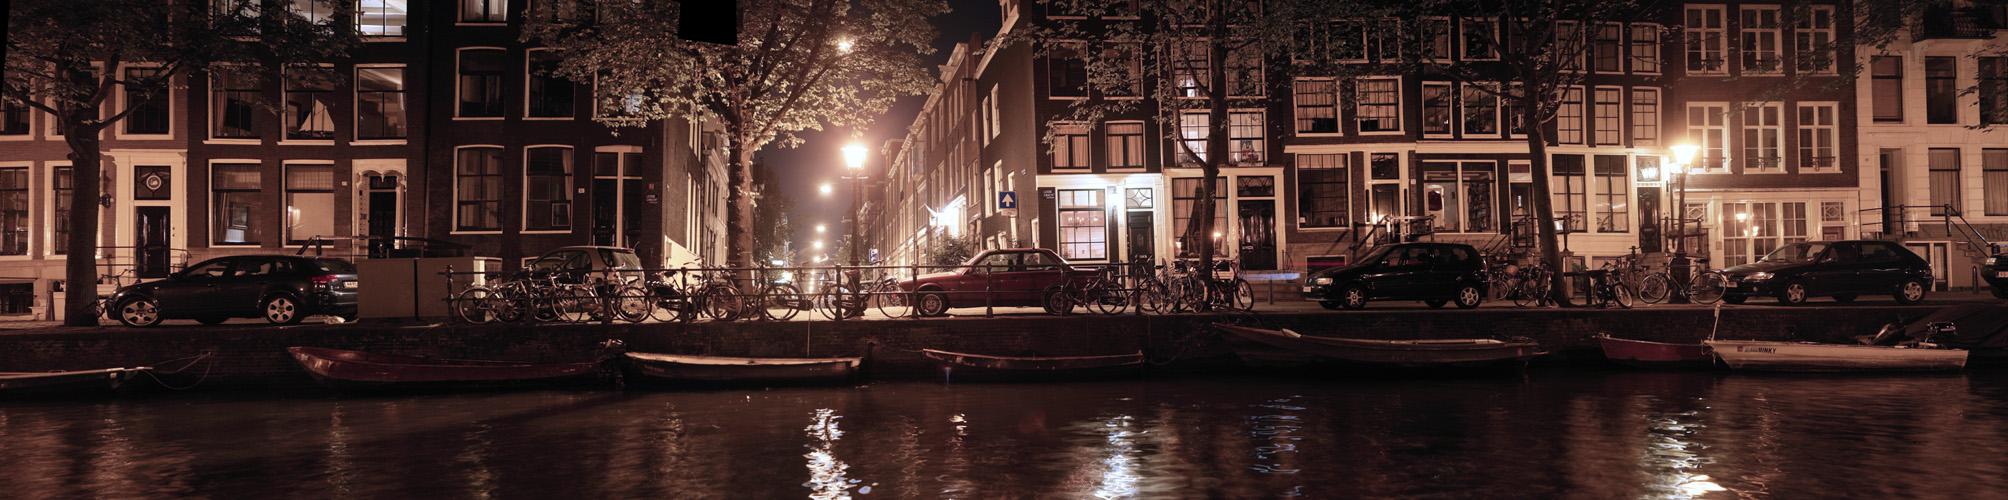 etma-amsterdam-1